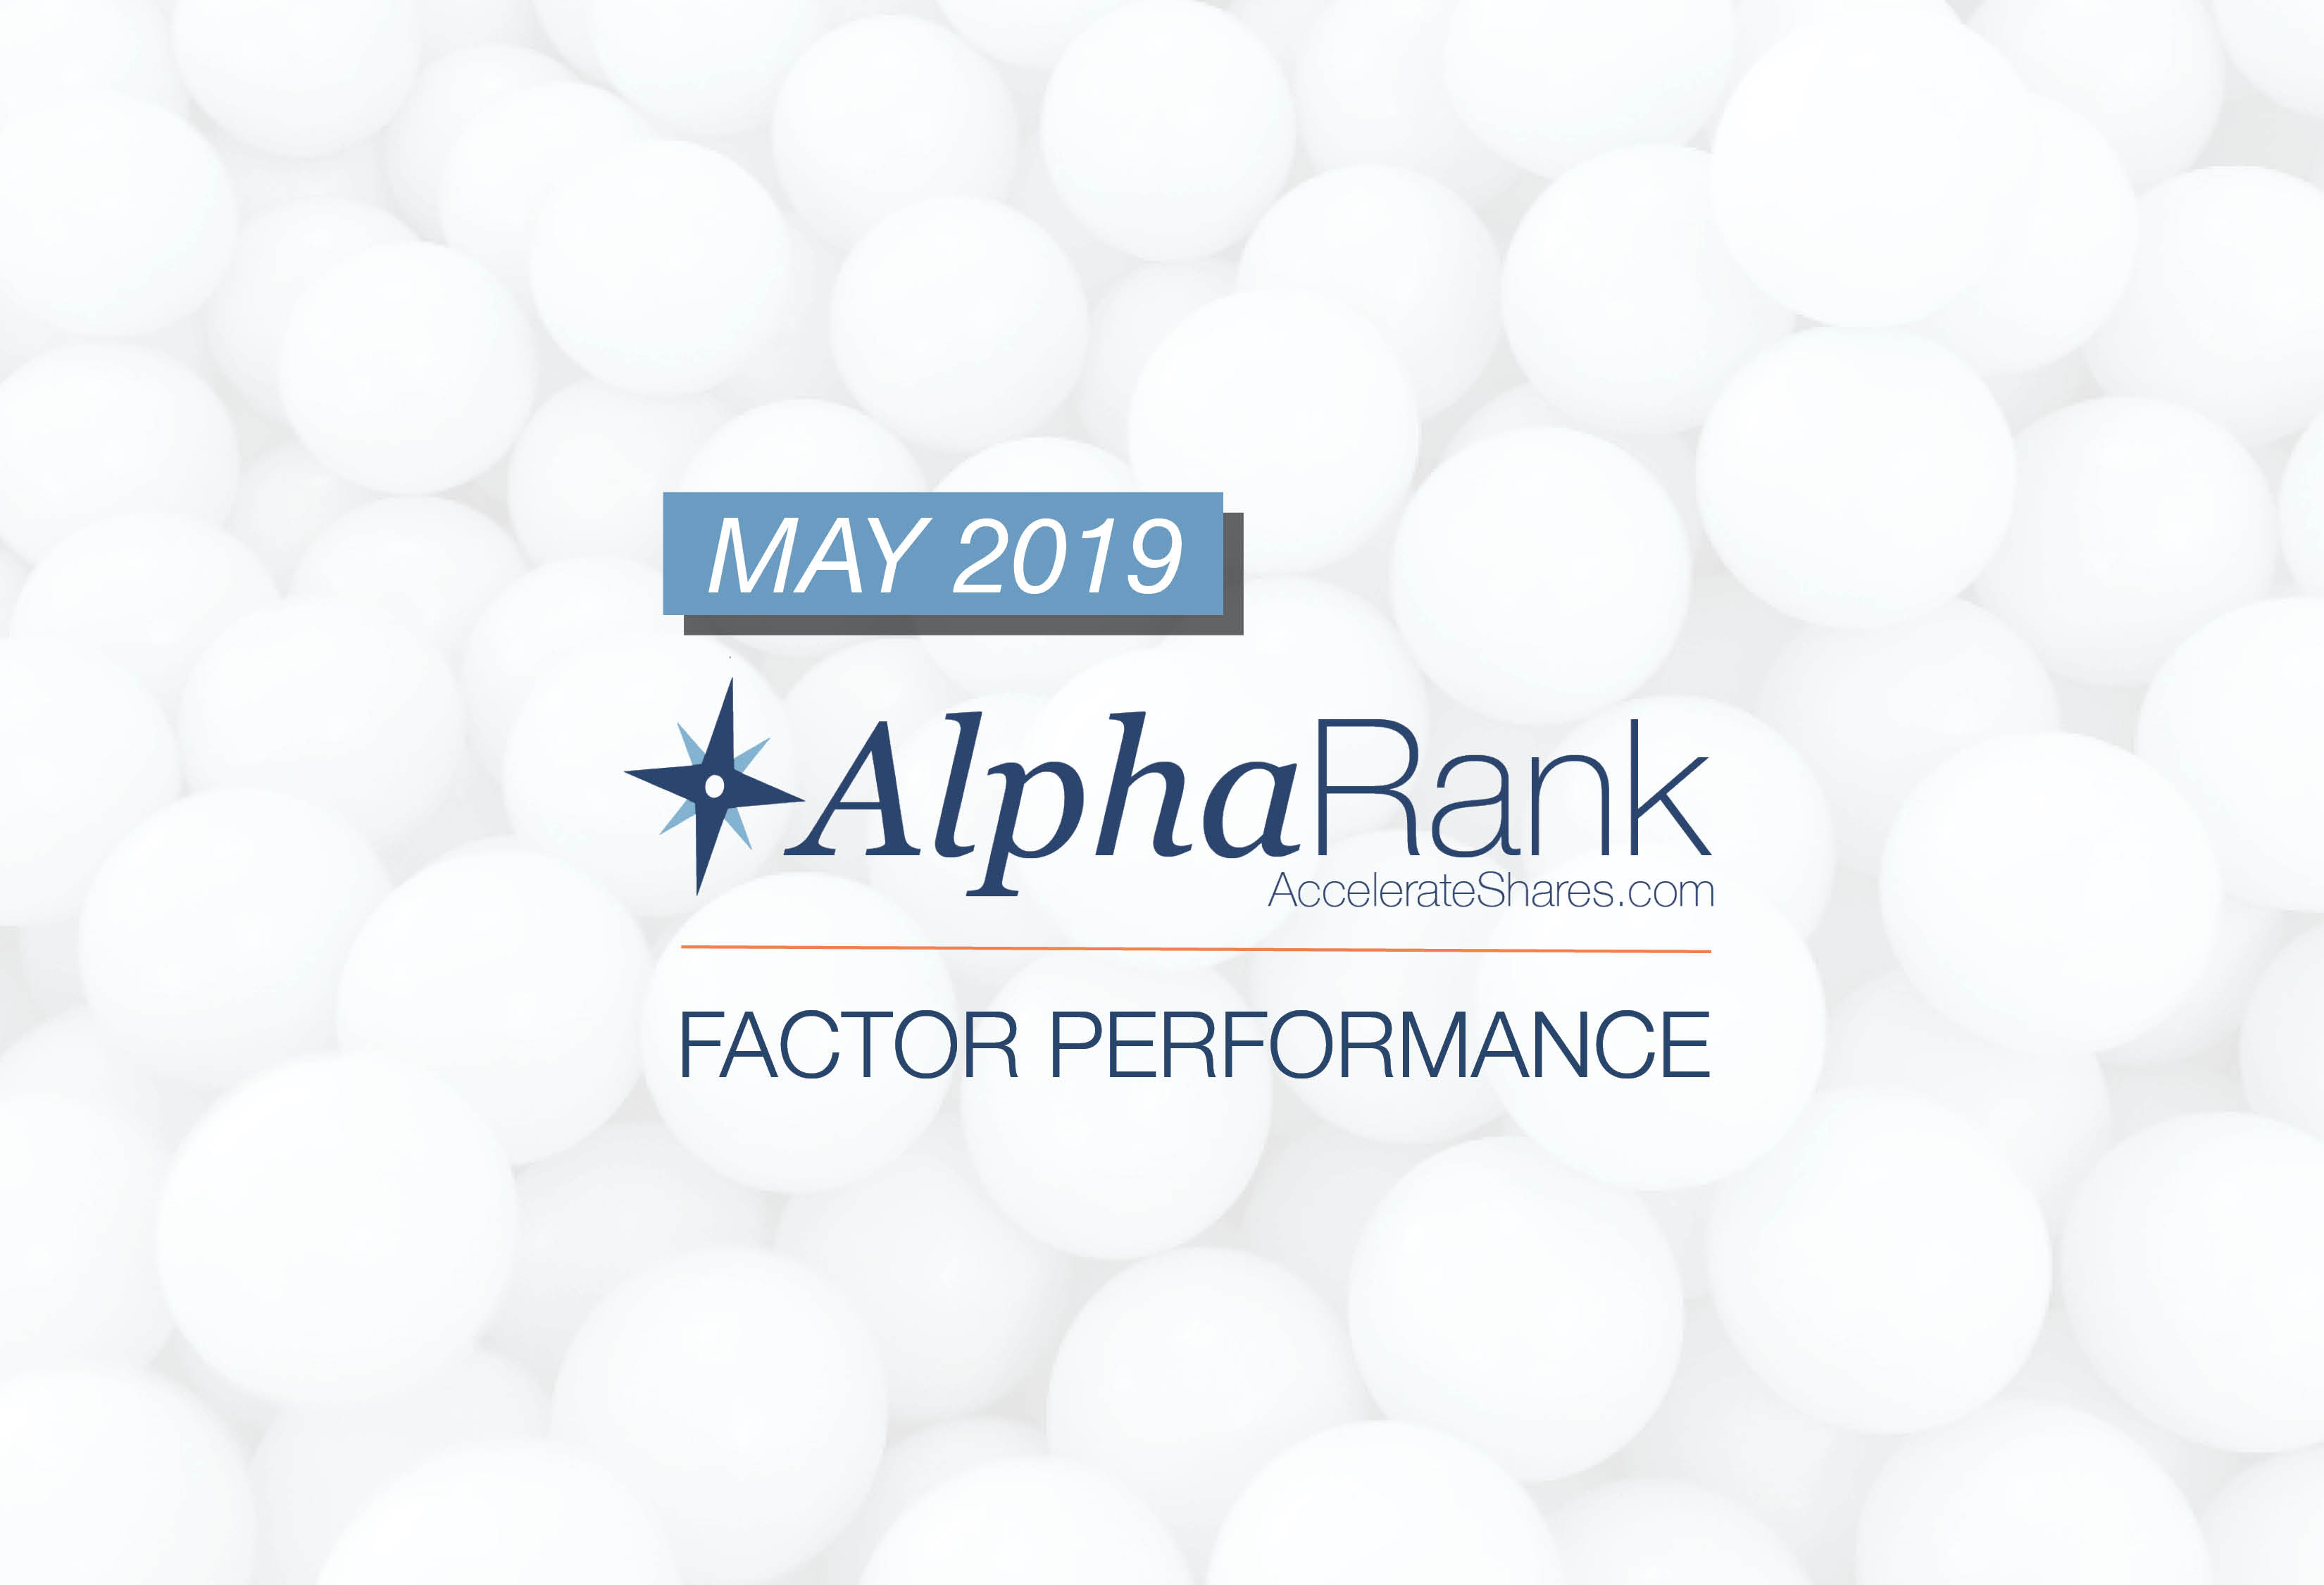 AlphaRank Factor Performance– May 2019